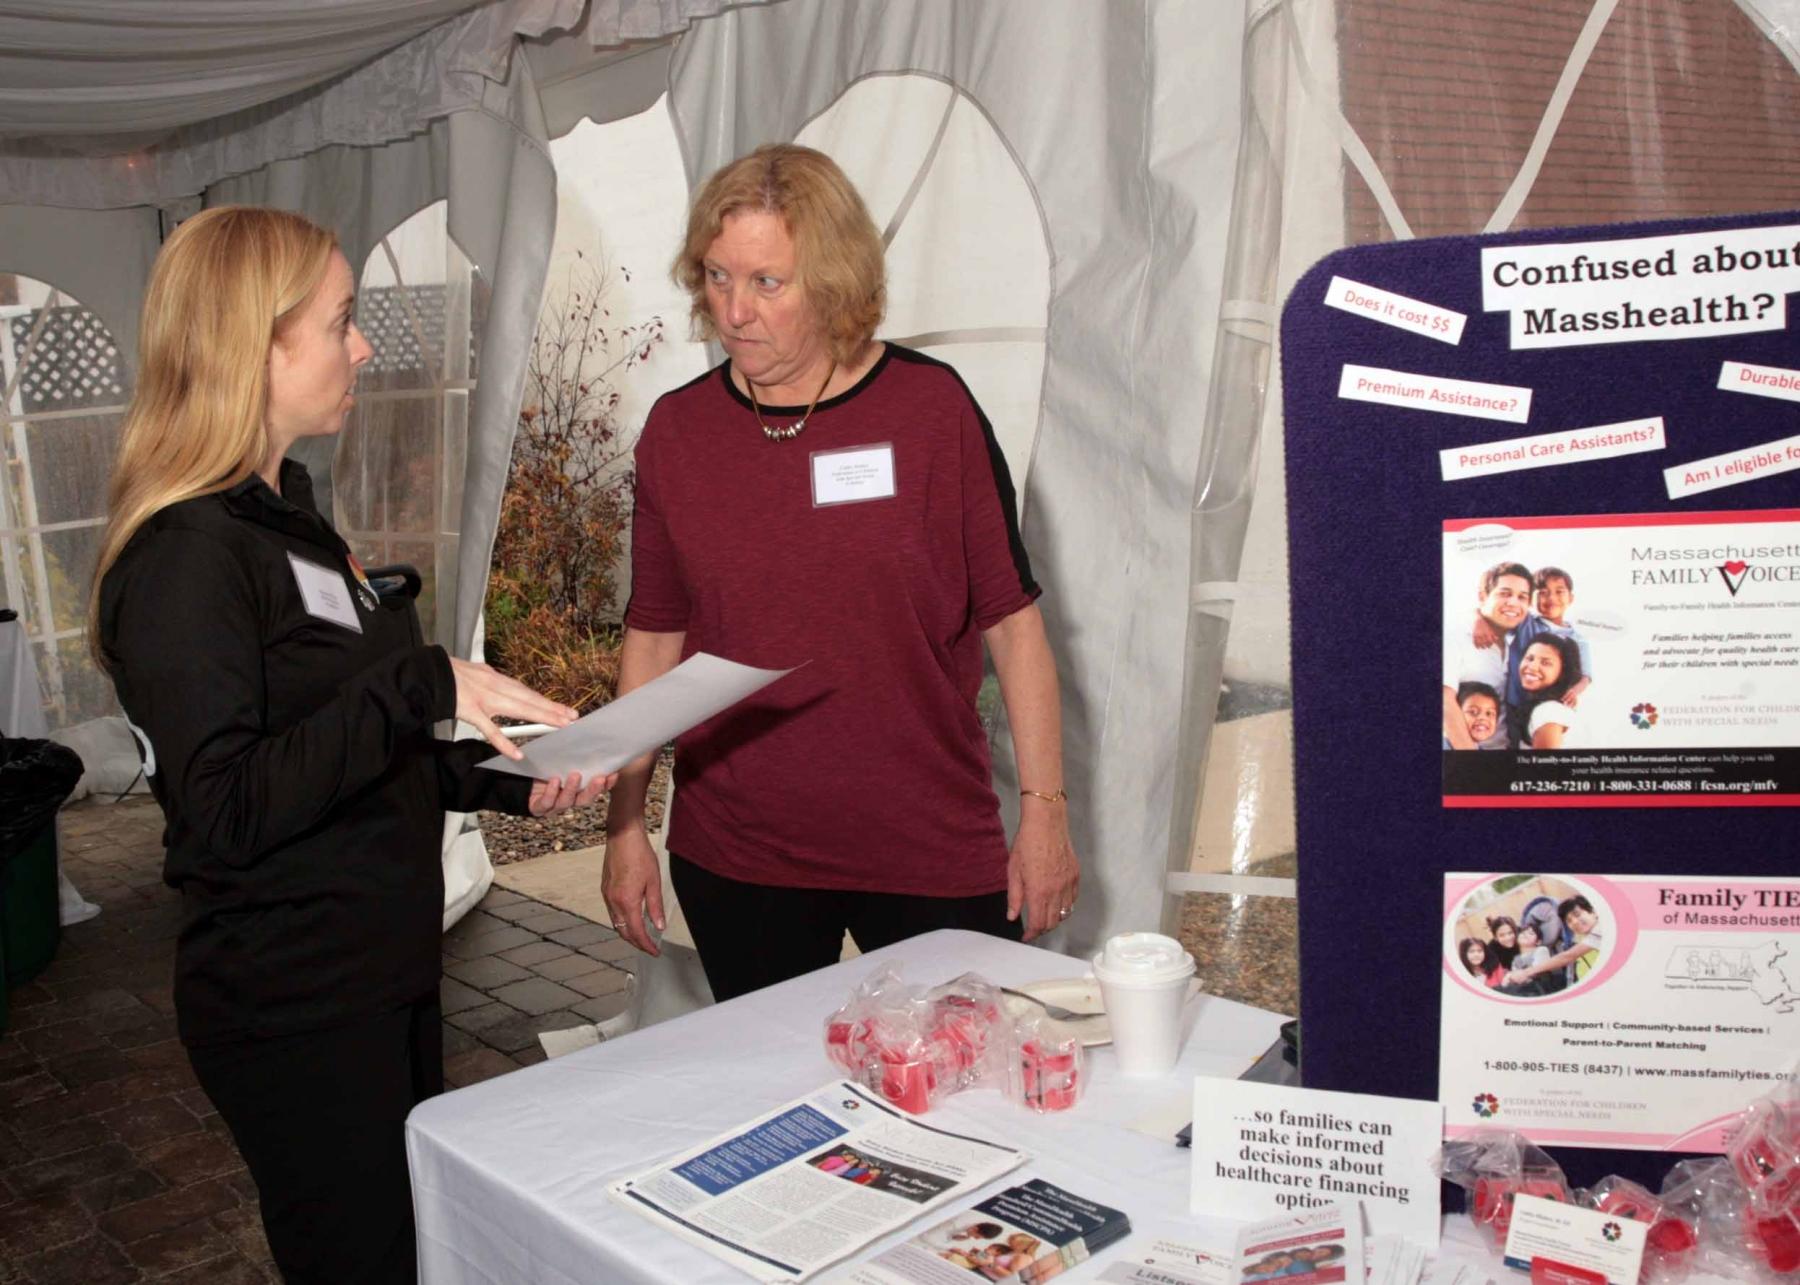 MA PTA Health Summit Vendors